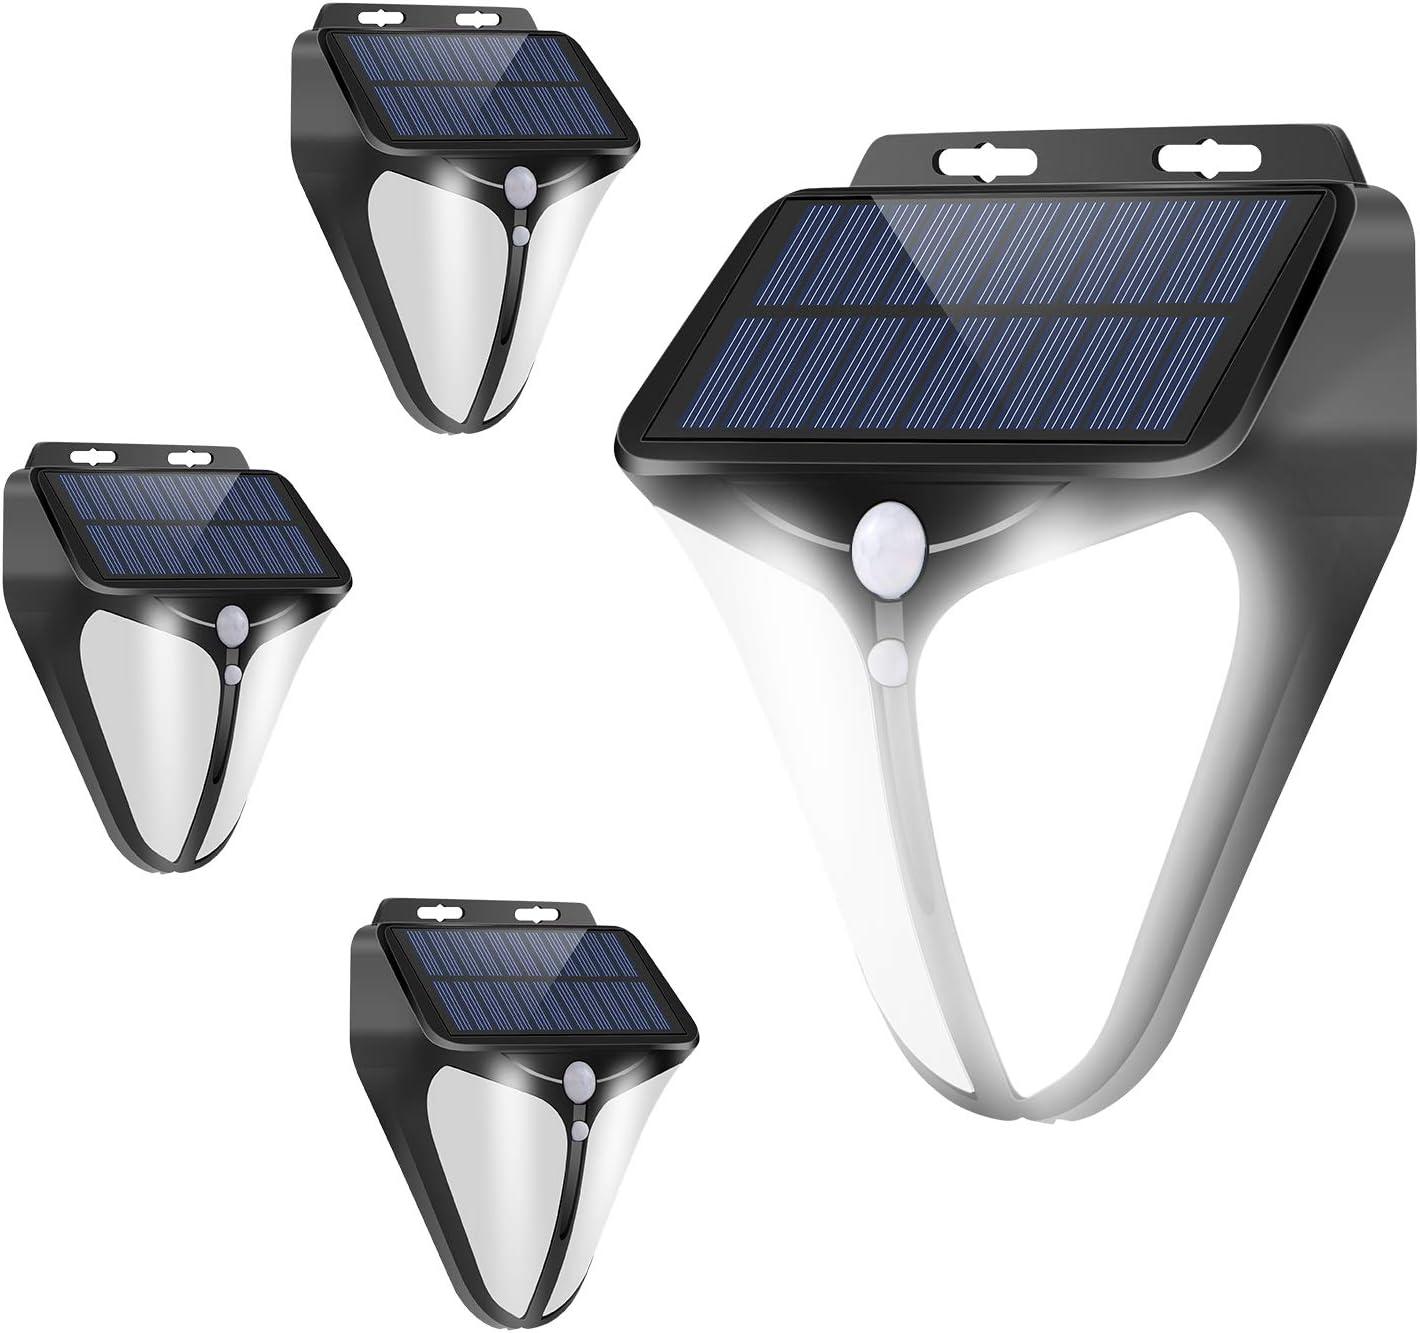 A-ZONE Solar Motion Sensor Light Outdoor, 200 Lumens Wireless Motion Sensor Lights,IP66 Waterproof Wall Light Easy-to-Install Security Lights for Garden Patios Lawns,or Viewing Decks